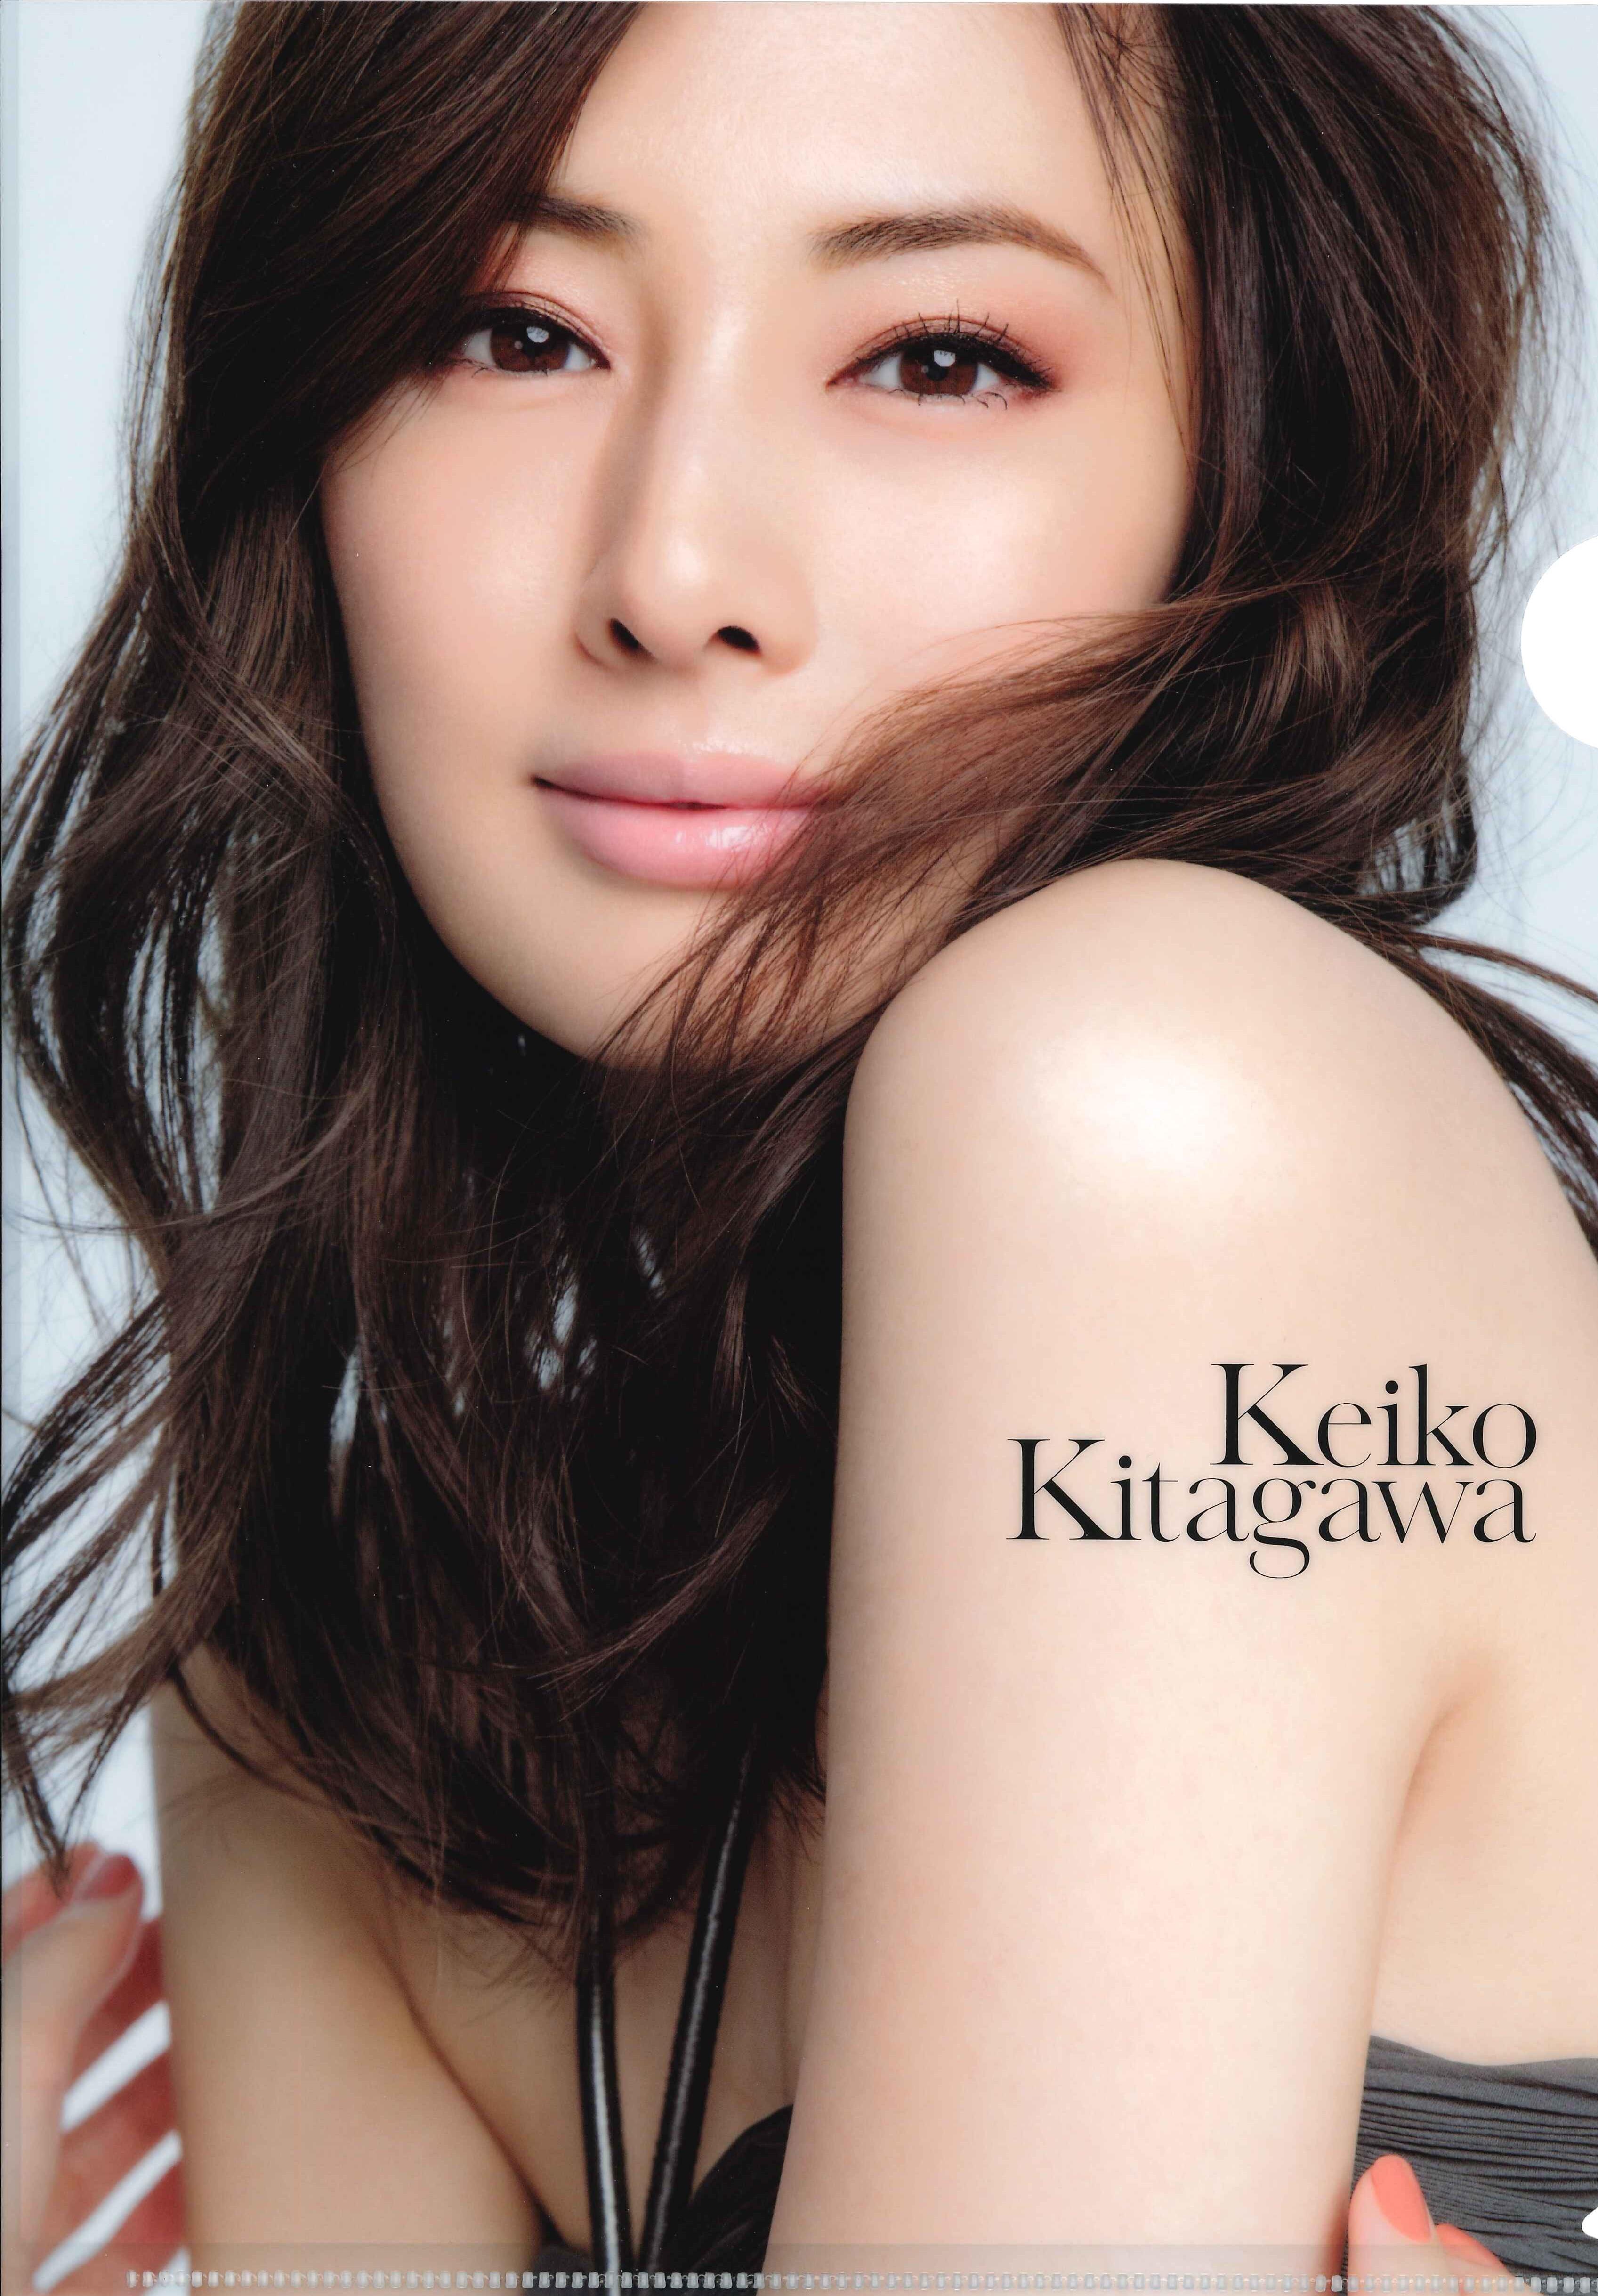 Send A Telegram >> Keiko Kitagawa 2018 calendar photo goods   TAF: apn